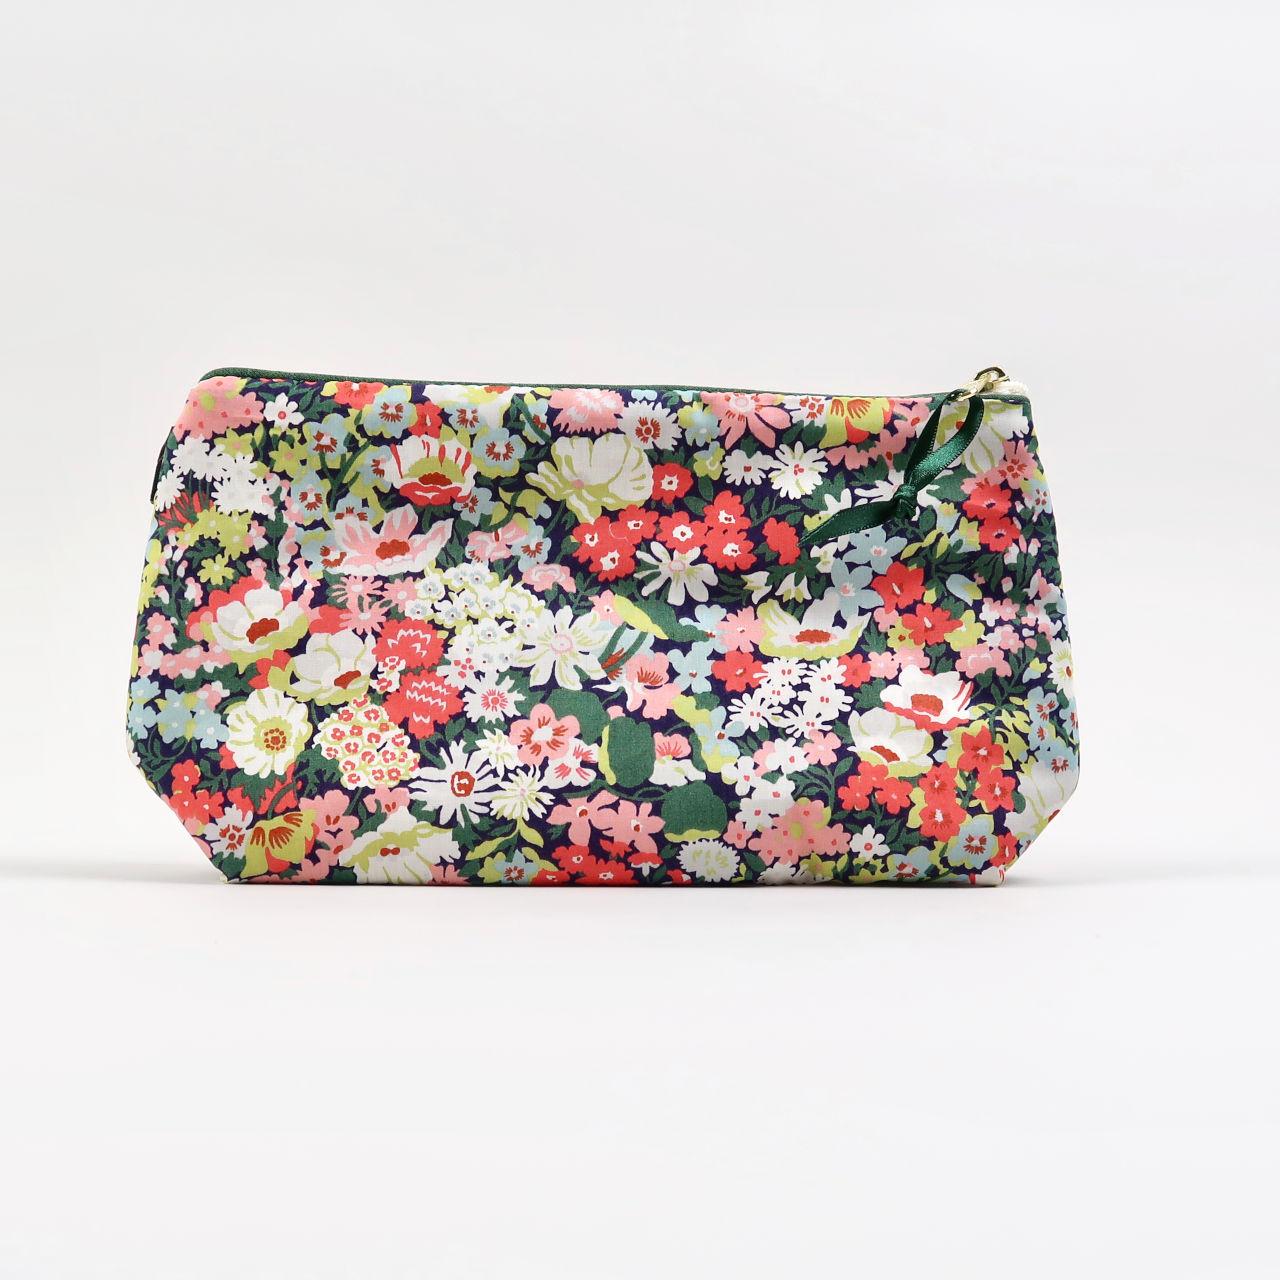 Liberty Print Cosmetic Bag - Thorpe Meadow